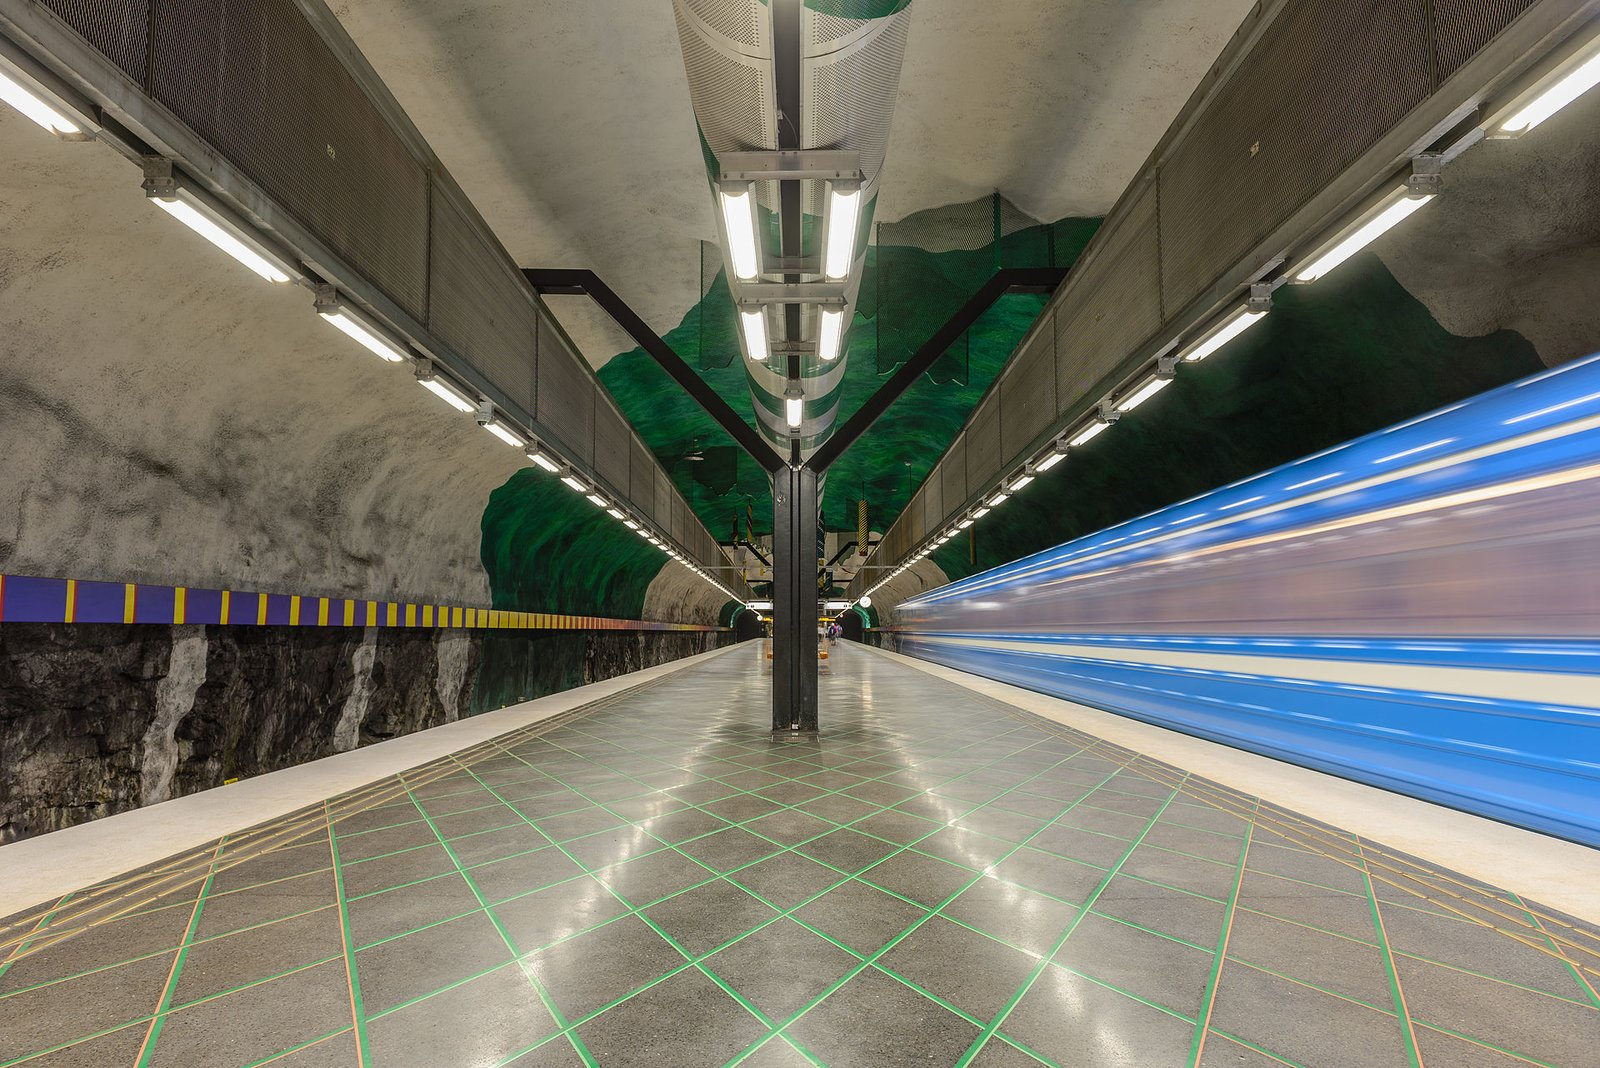 Photo 4 of 10 in Explore the Stockholm Metro For a Tour Through 5 Decades of European Art History